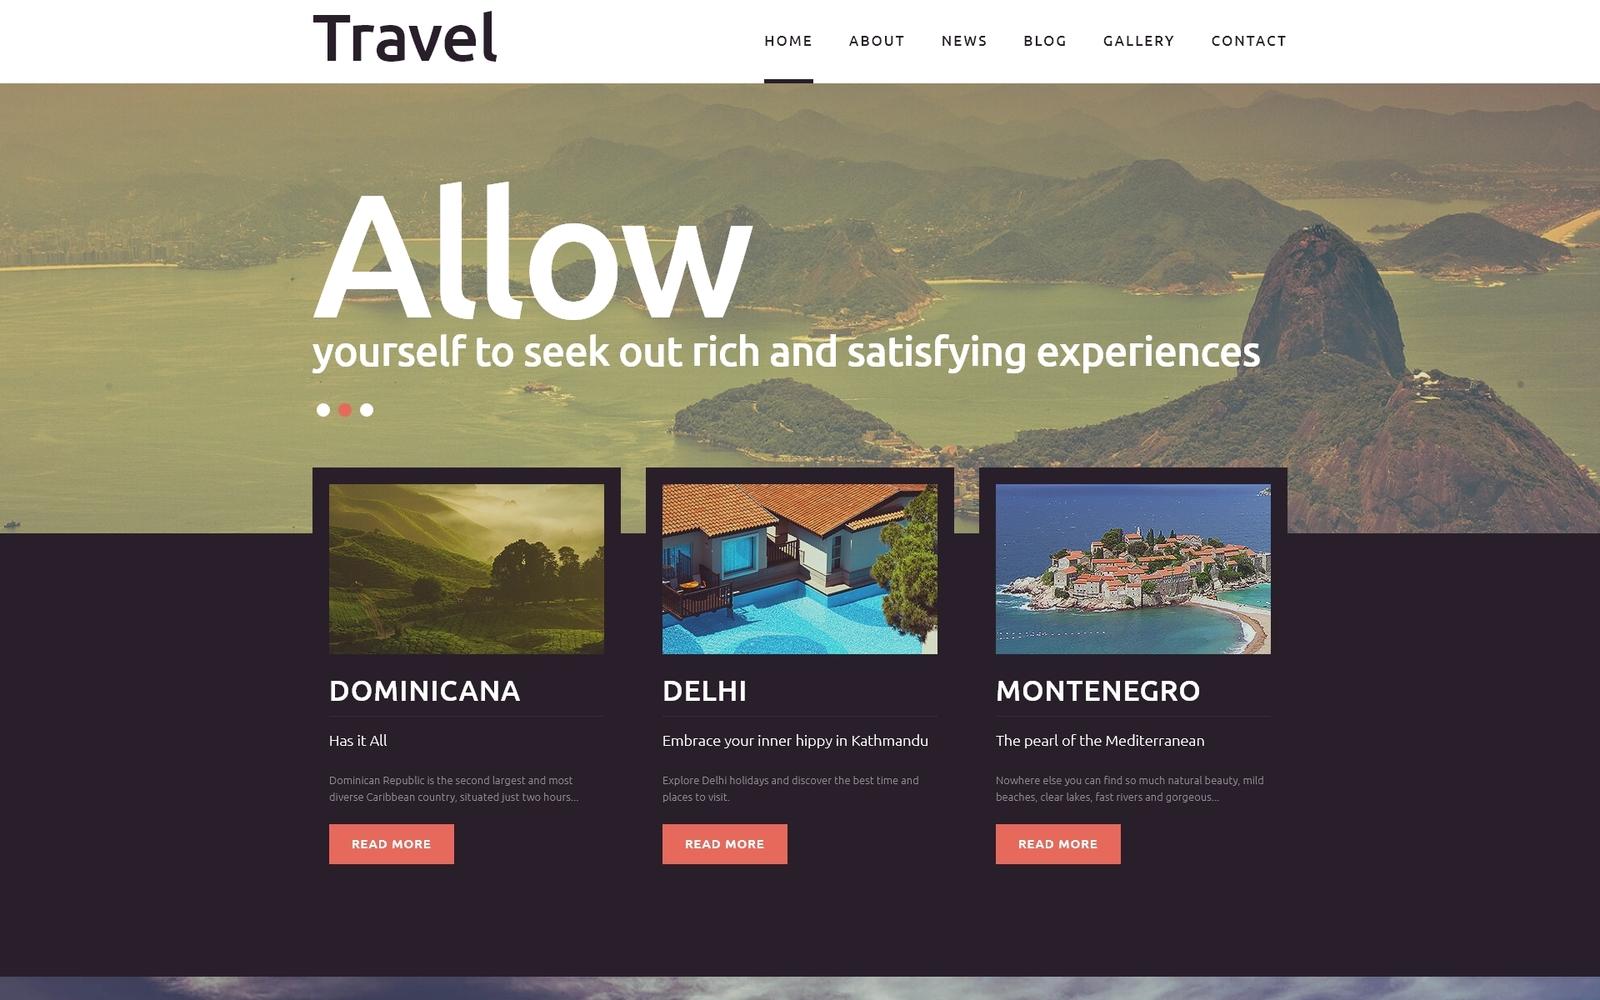 Travel - Fancy Tourism Blog №51191